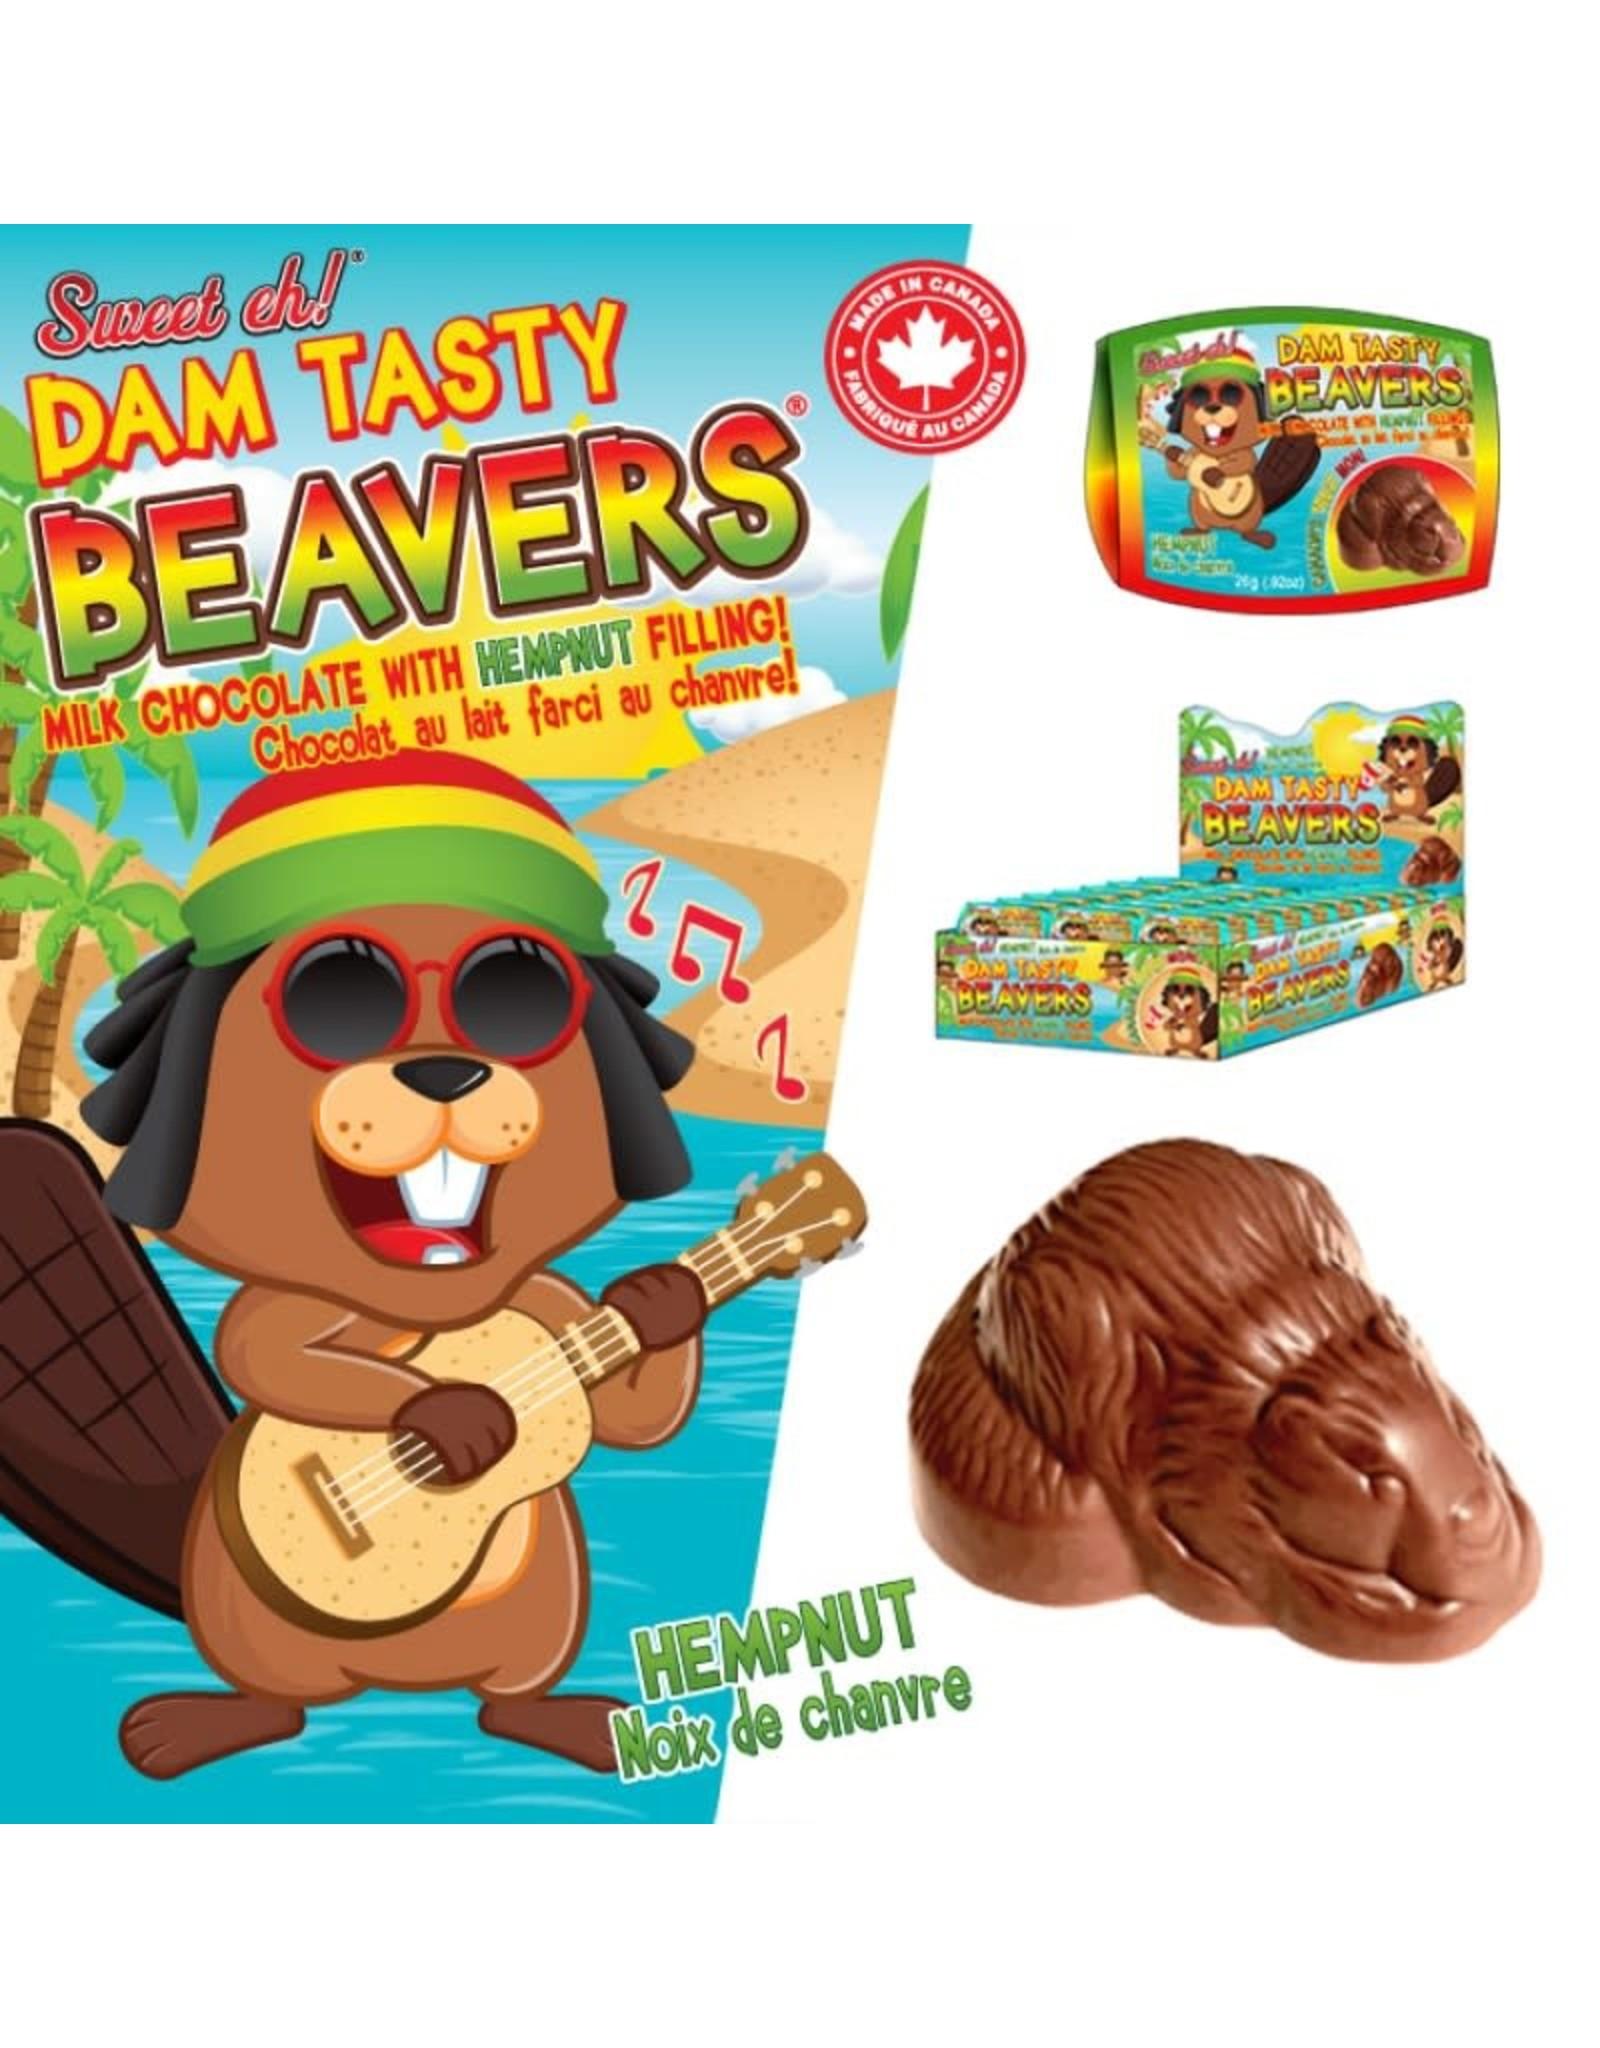 Jimmy Zees Dam Tasty Beaver - Milk Chocolate Hempnut